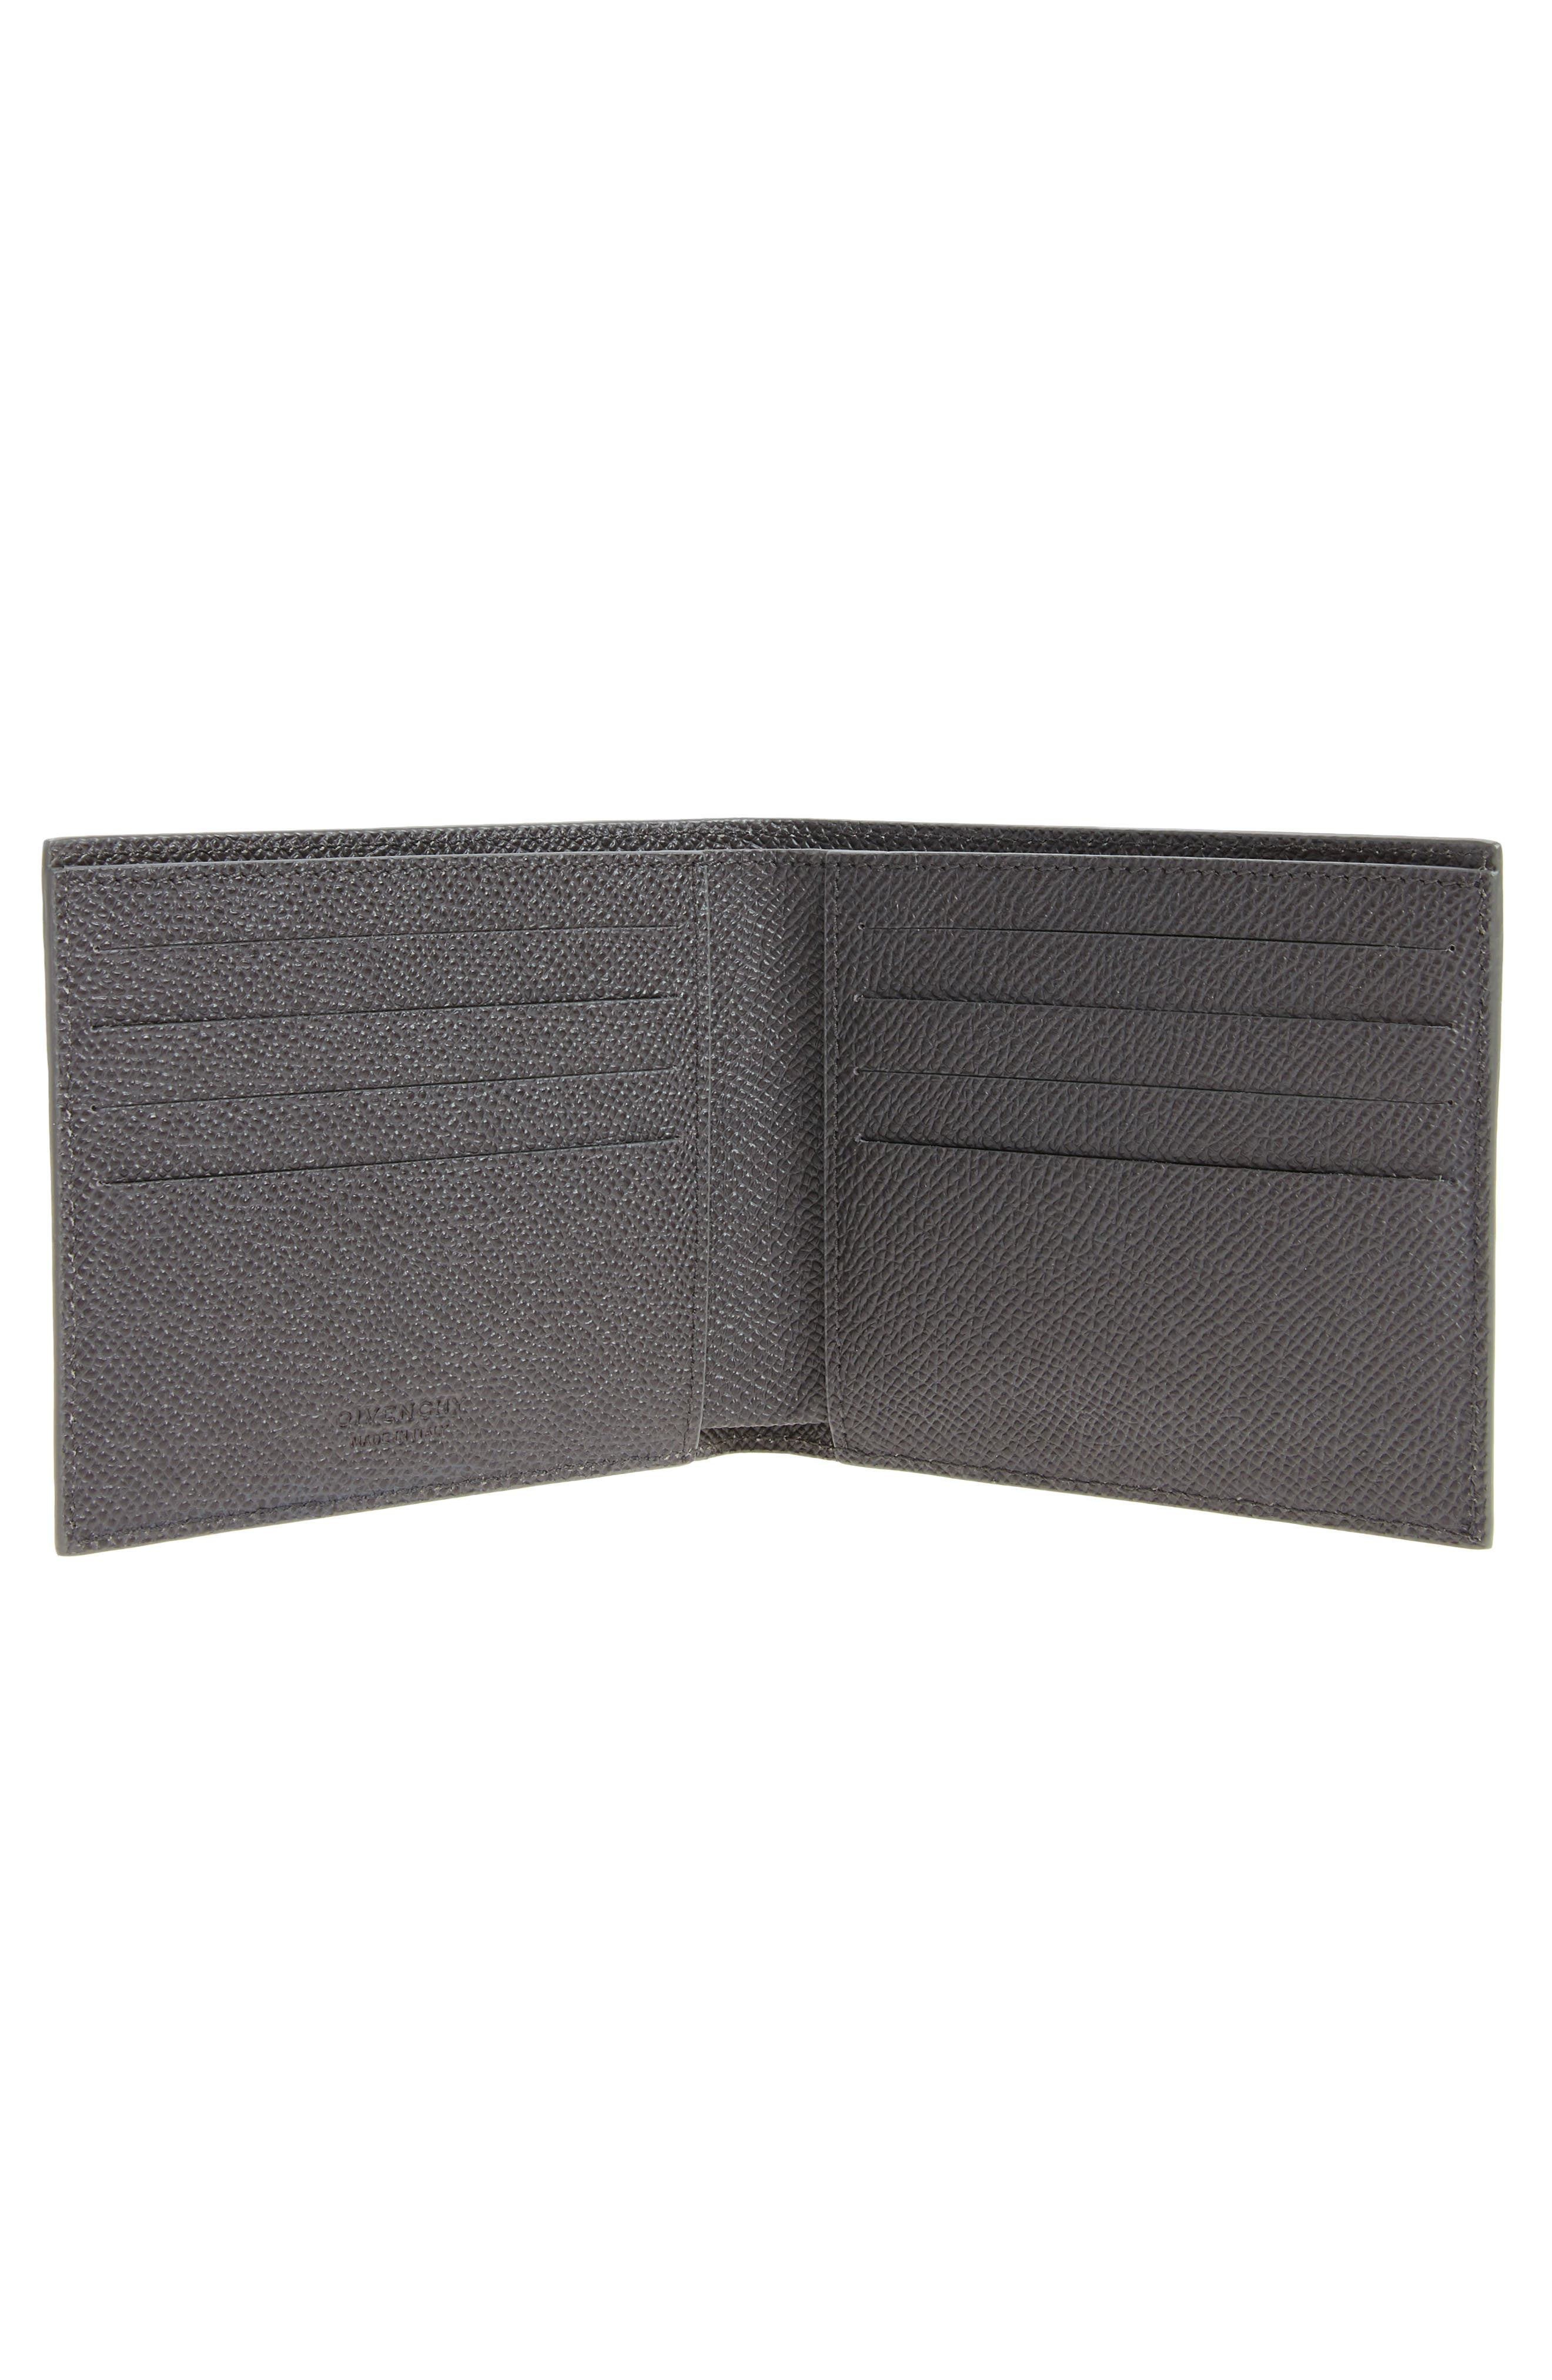 Alternate Image 2  - Givenchy Calfskin Leather Bifold Wallet